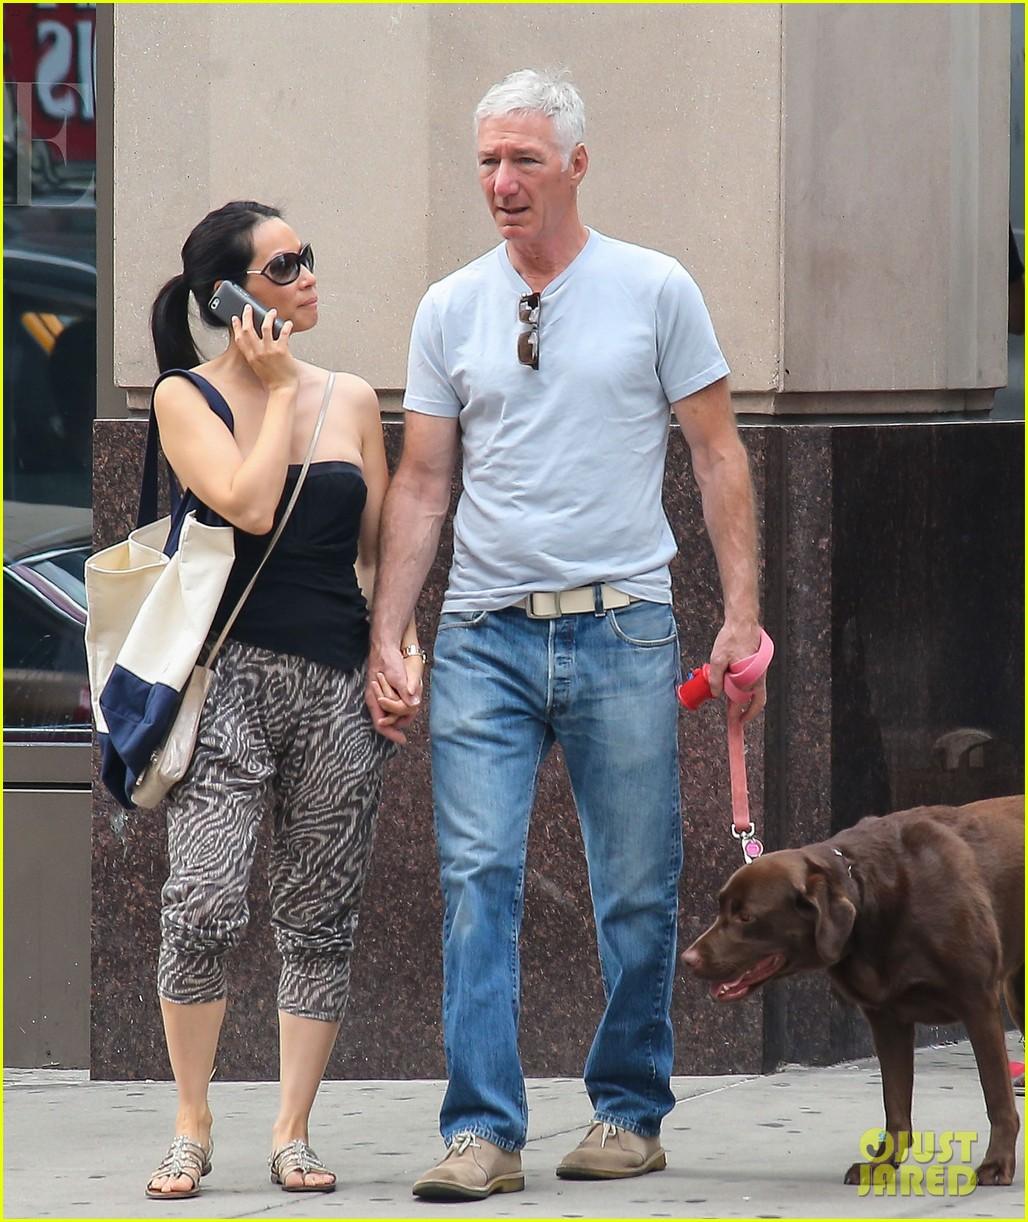 lucy liu new boyfriend hold hands in new york city 012932371